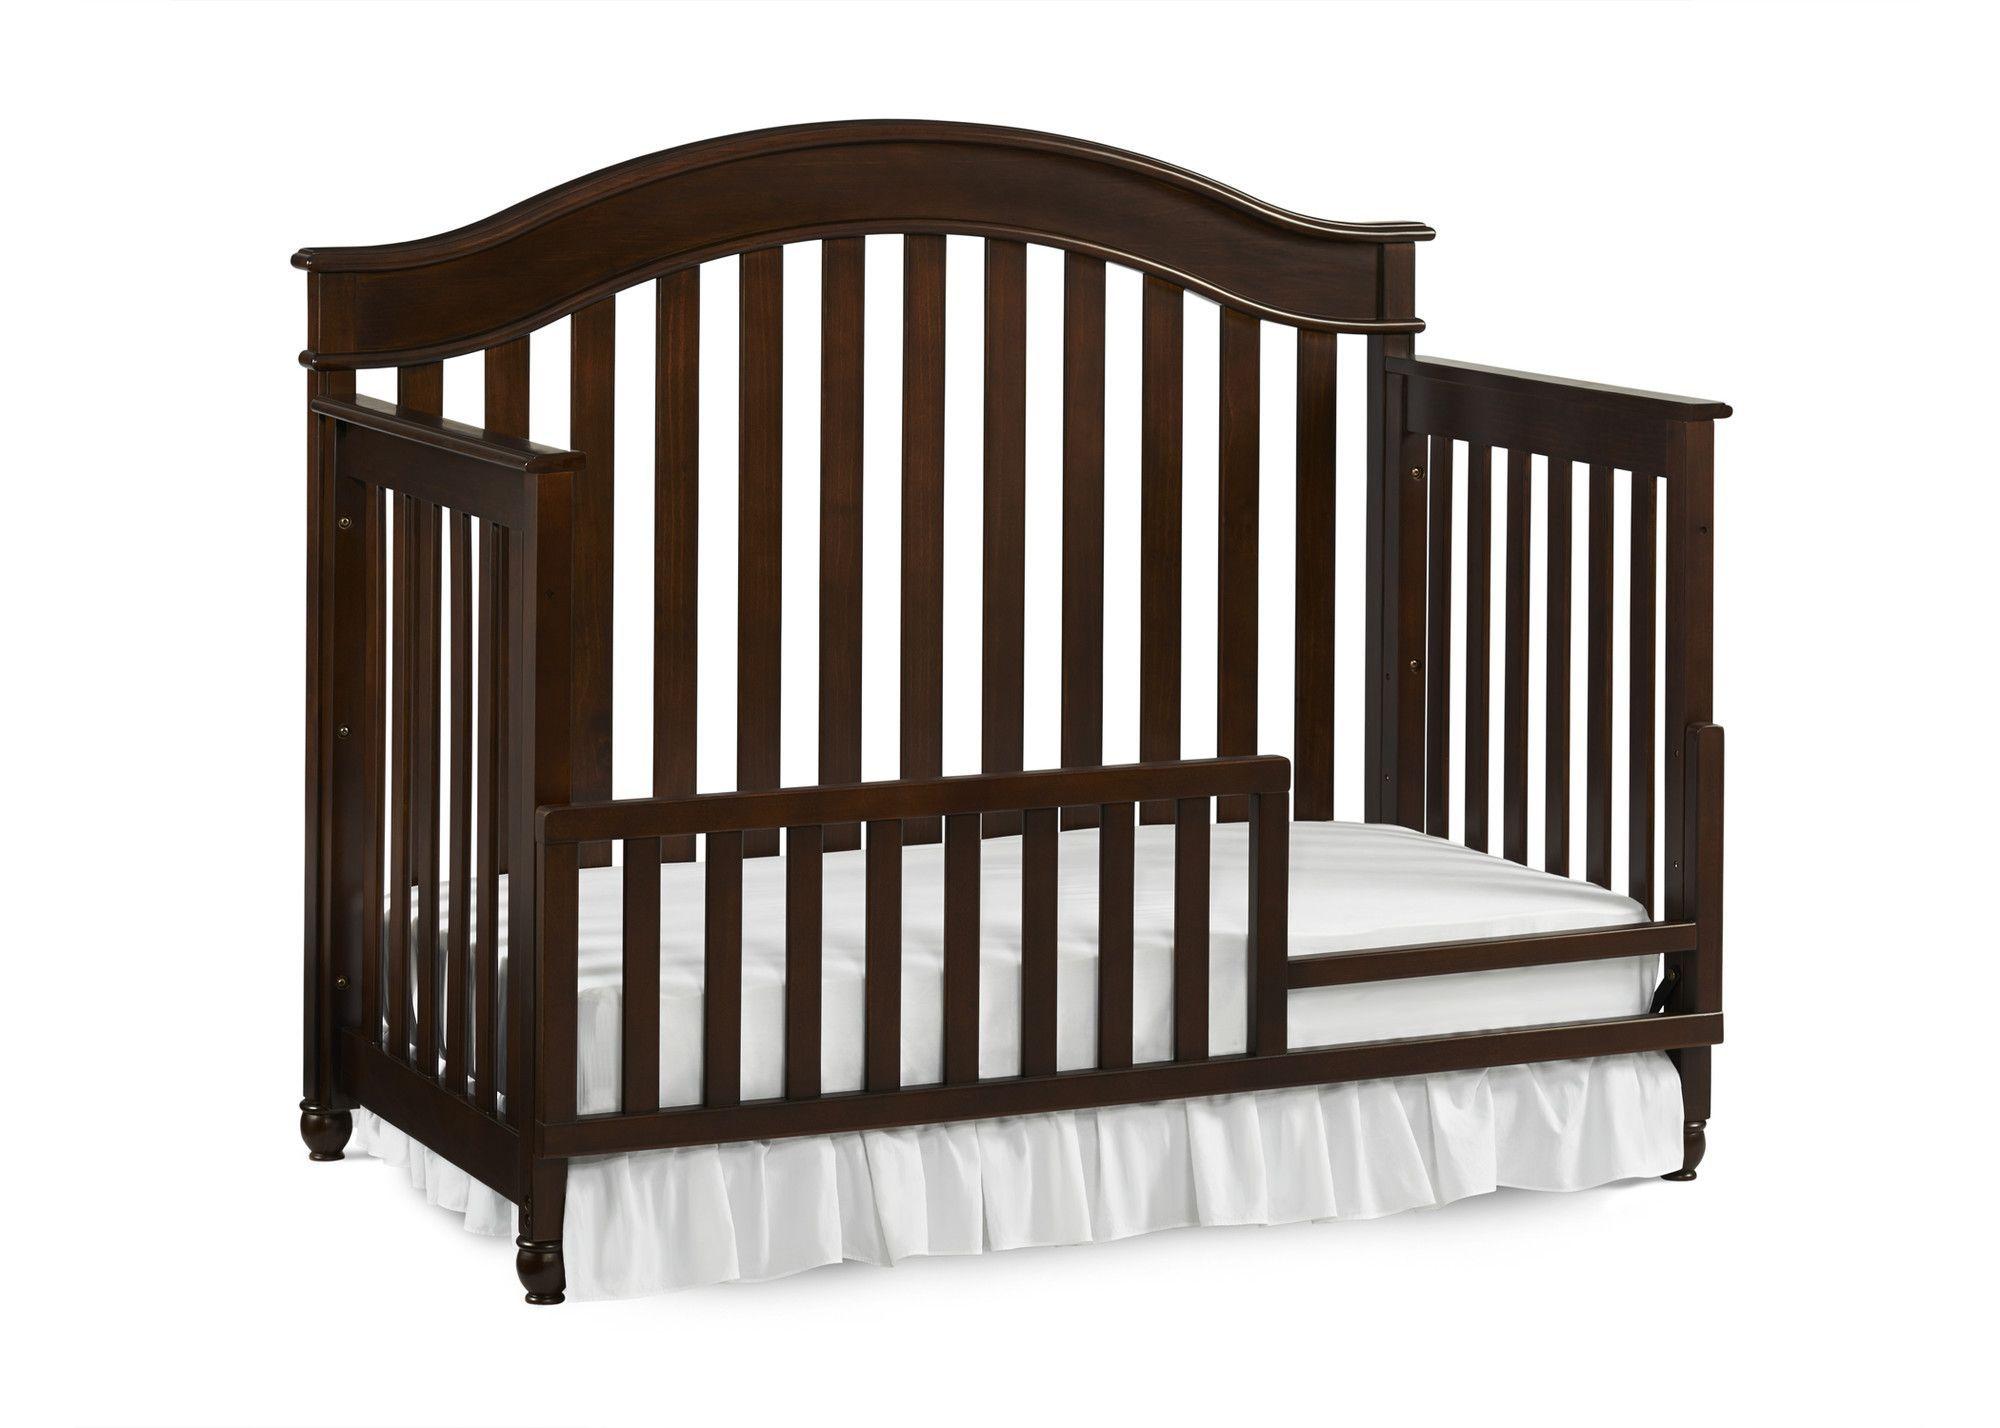 Universal Toddler Convertible Crib Guard Rail With Images Bed Rails For Toddlers Convertible Crib